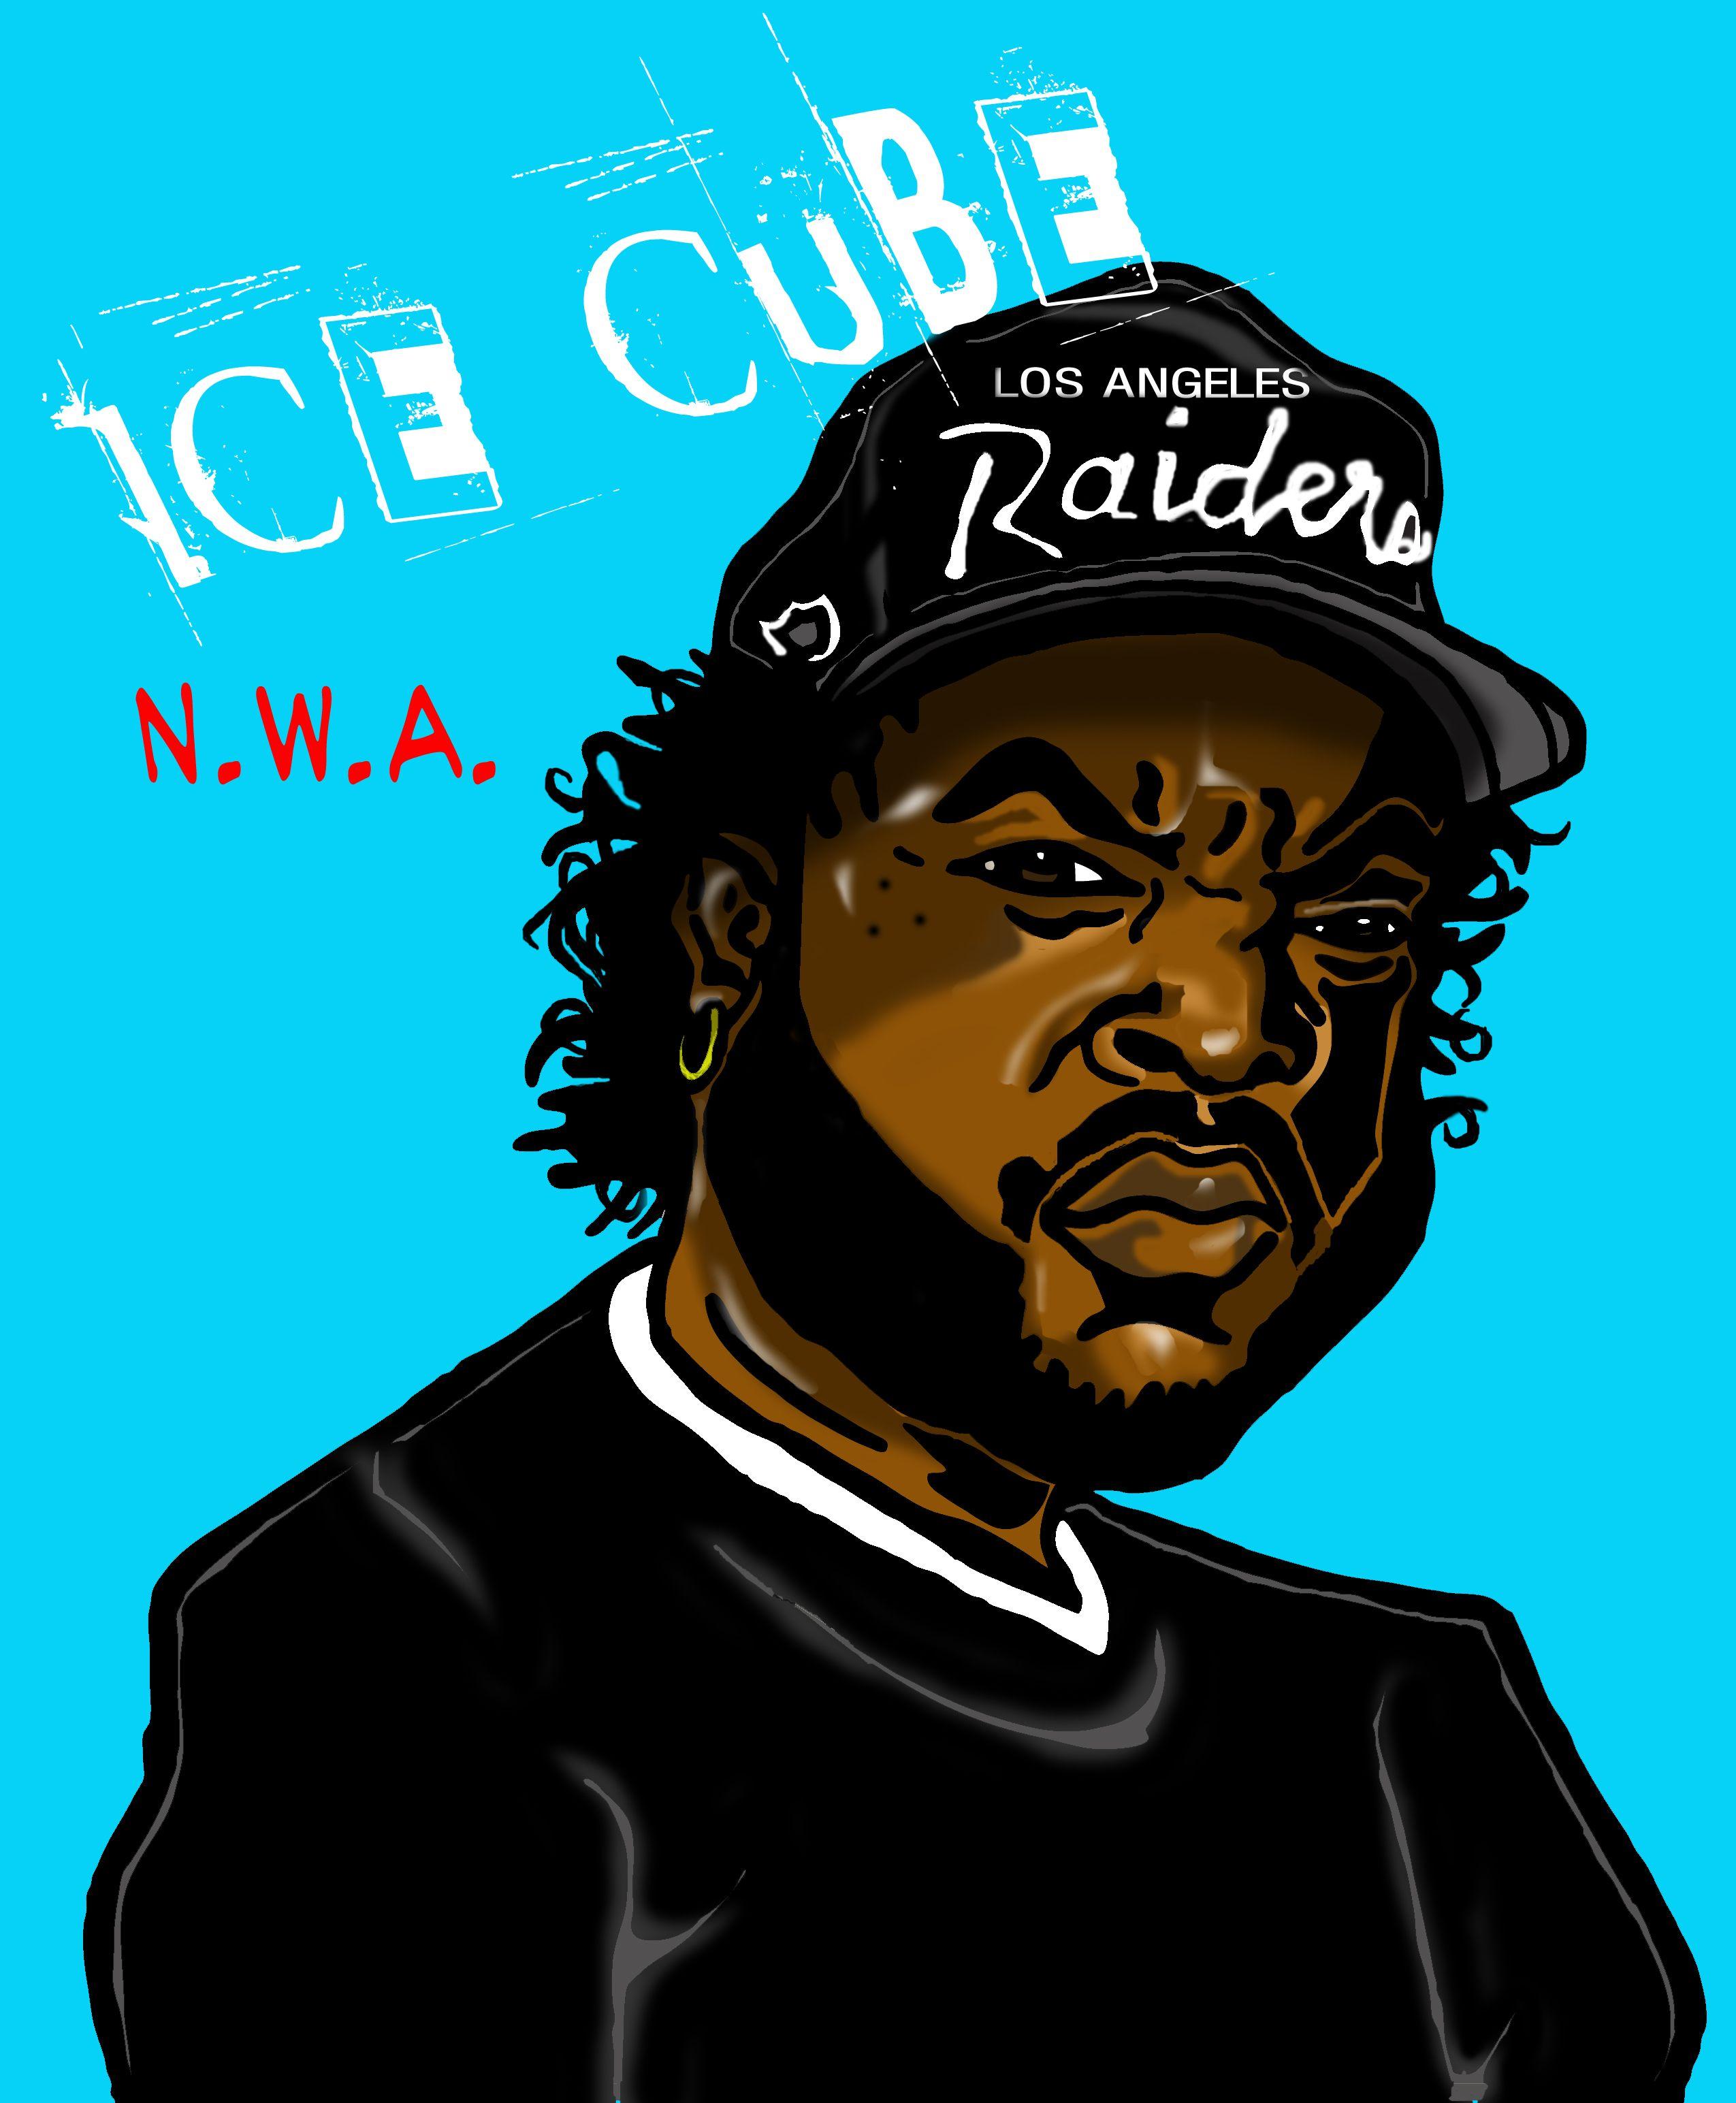 N.W.A. ILLUSTRATION! Gangsta rap, Celebrity caricatures